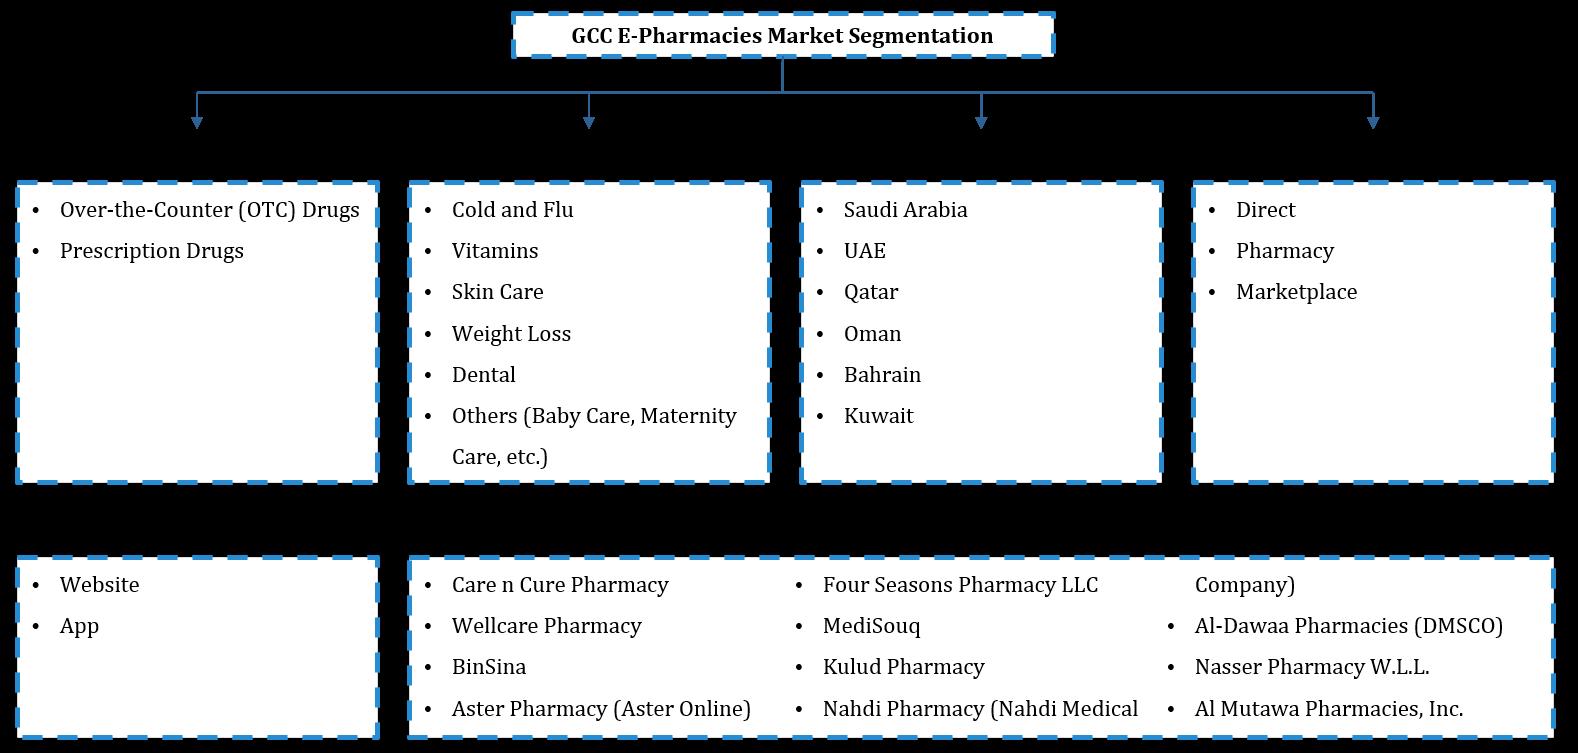 GCC E-pharmacies Market Segmentation